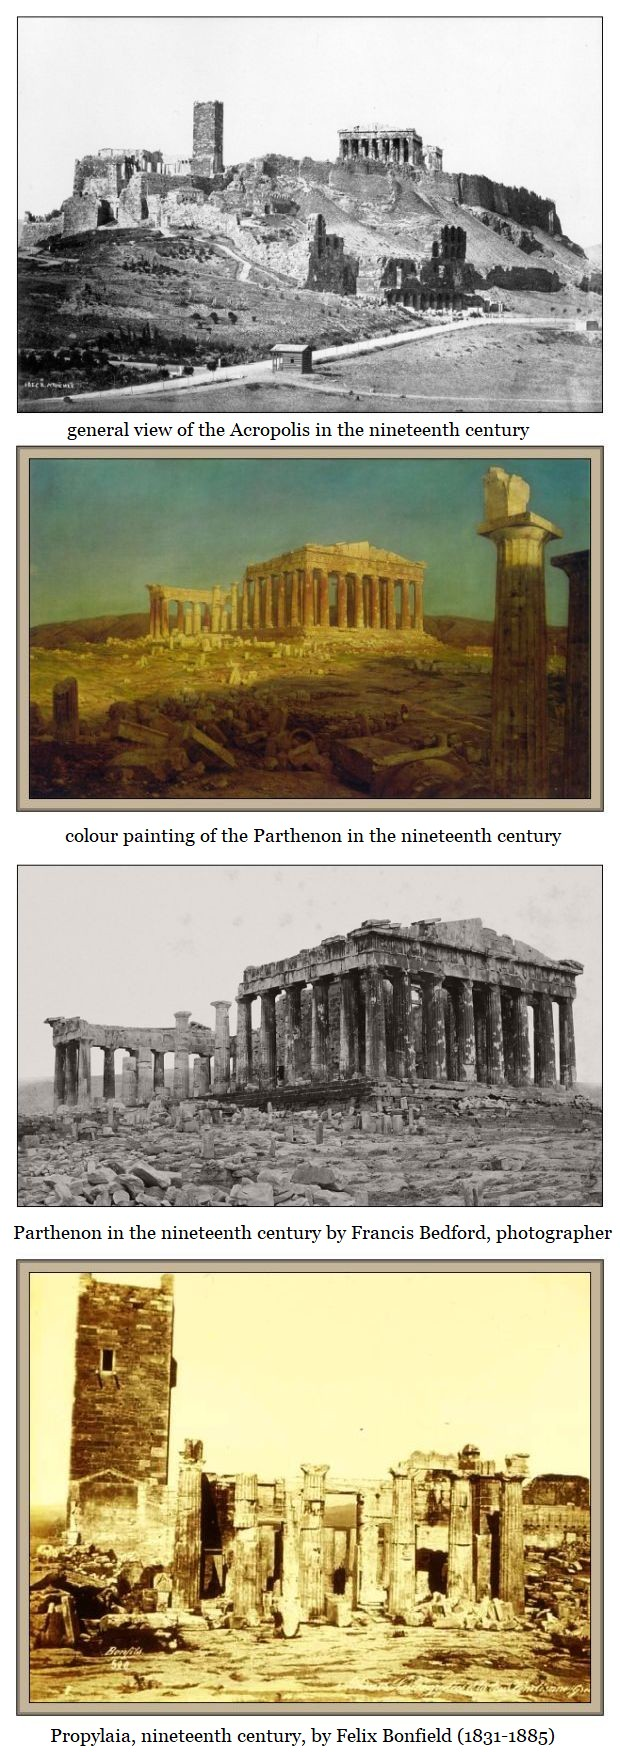 acropolis and propylaia nineteenth century